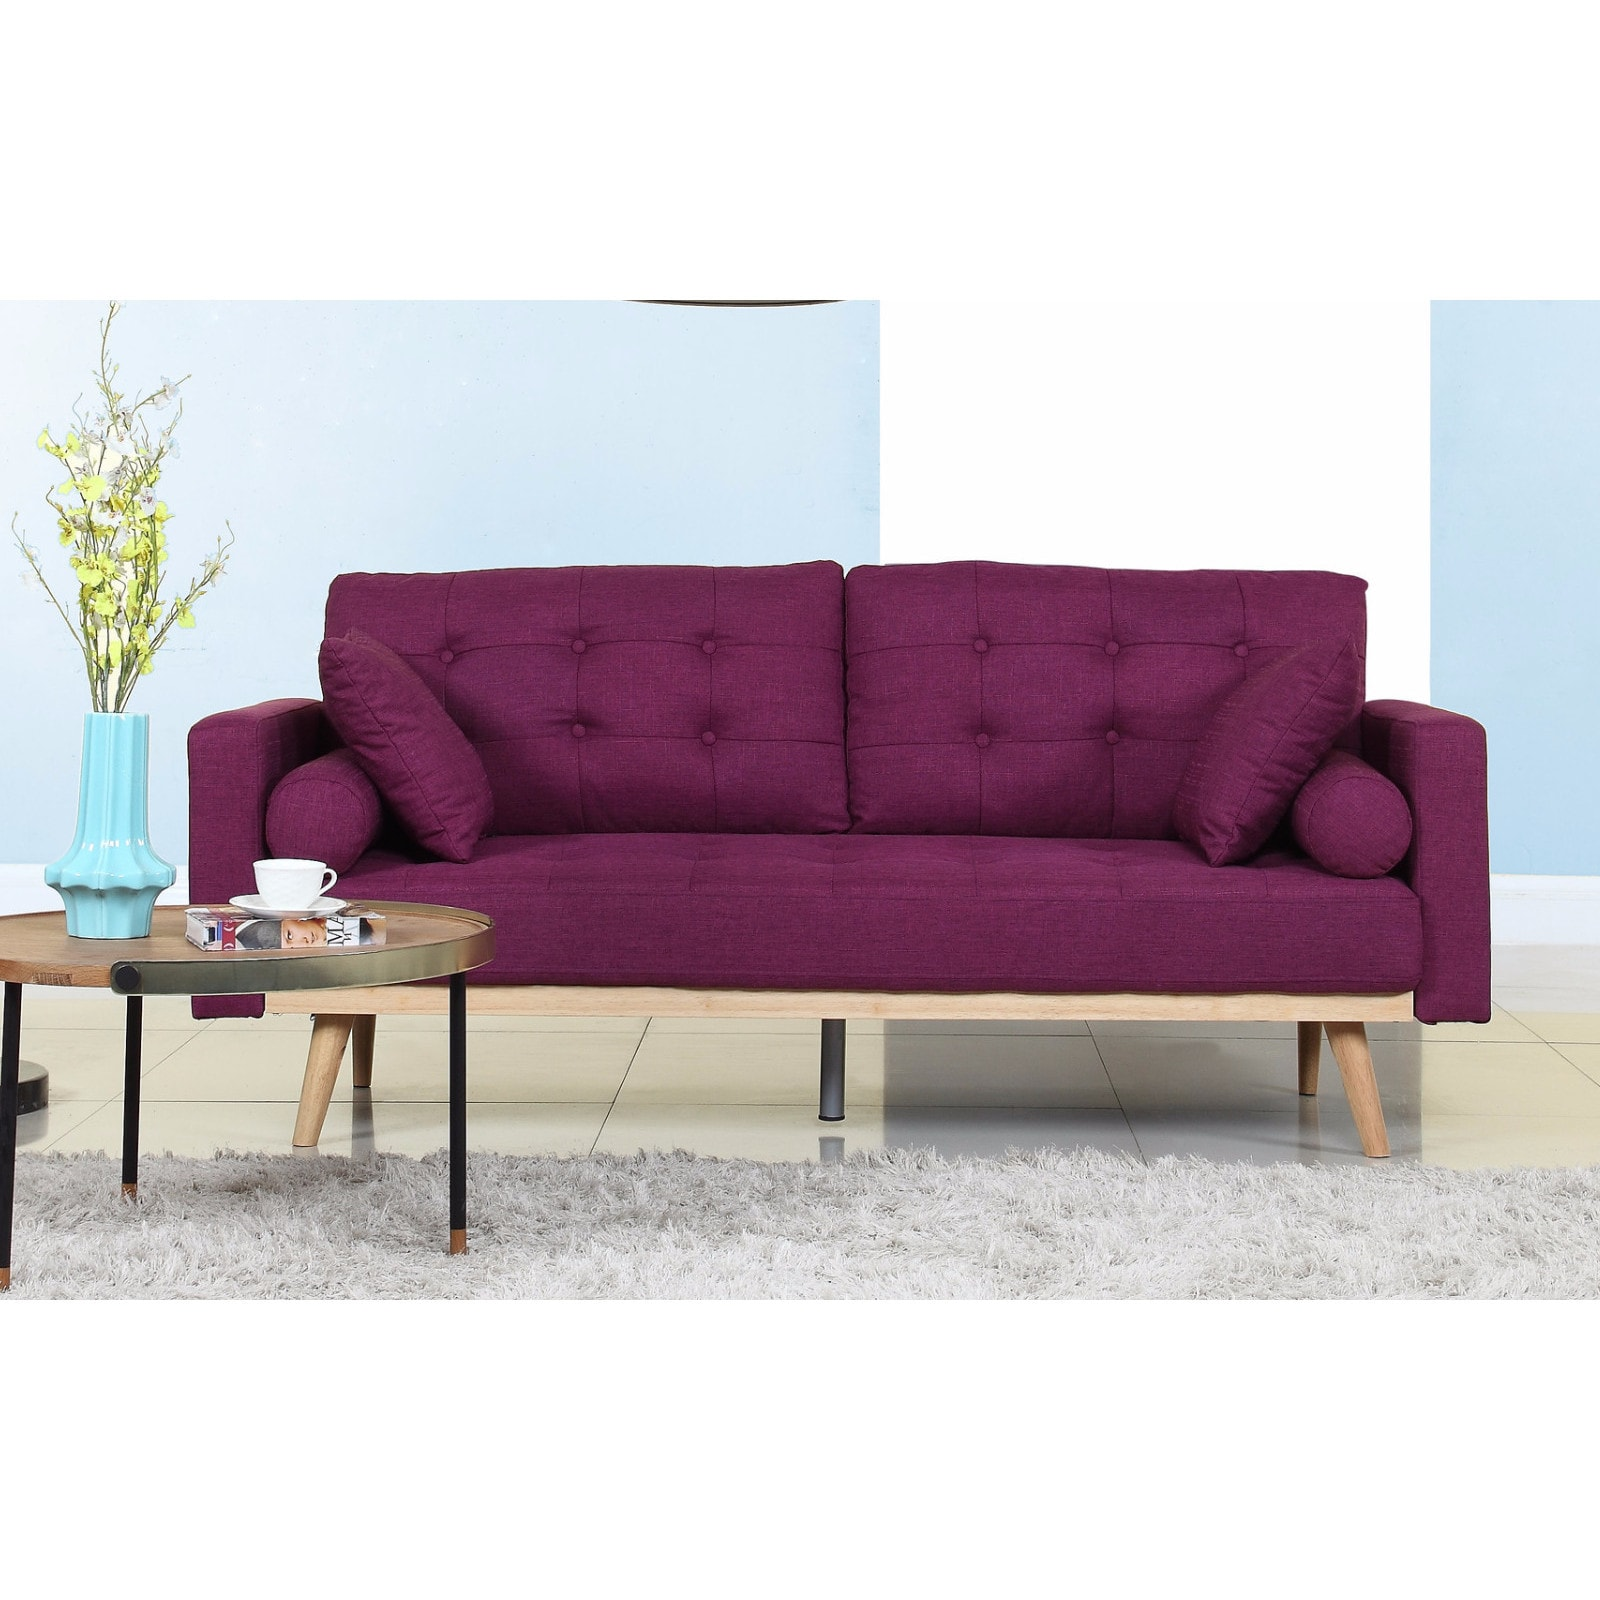 Madison Home Tufted Linen Mid Century Modern Sofa